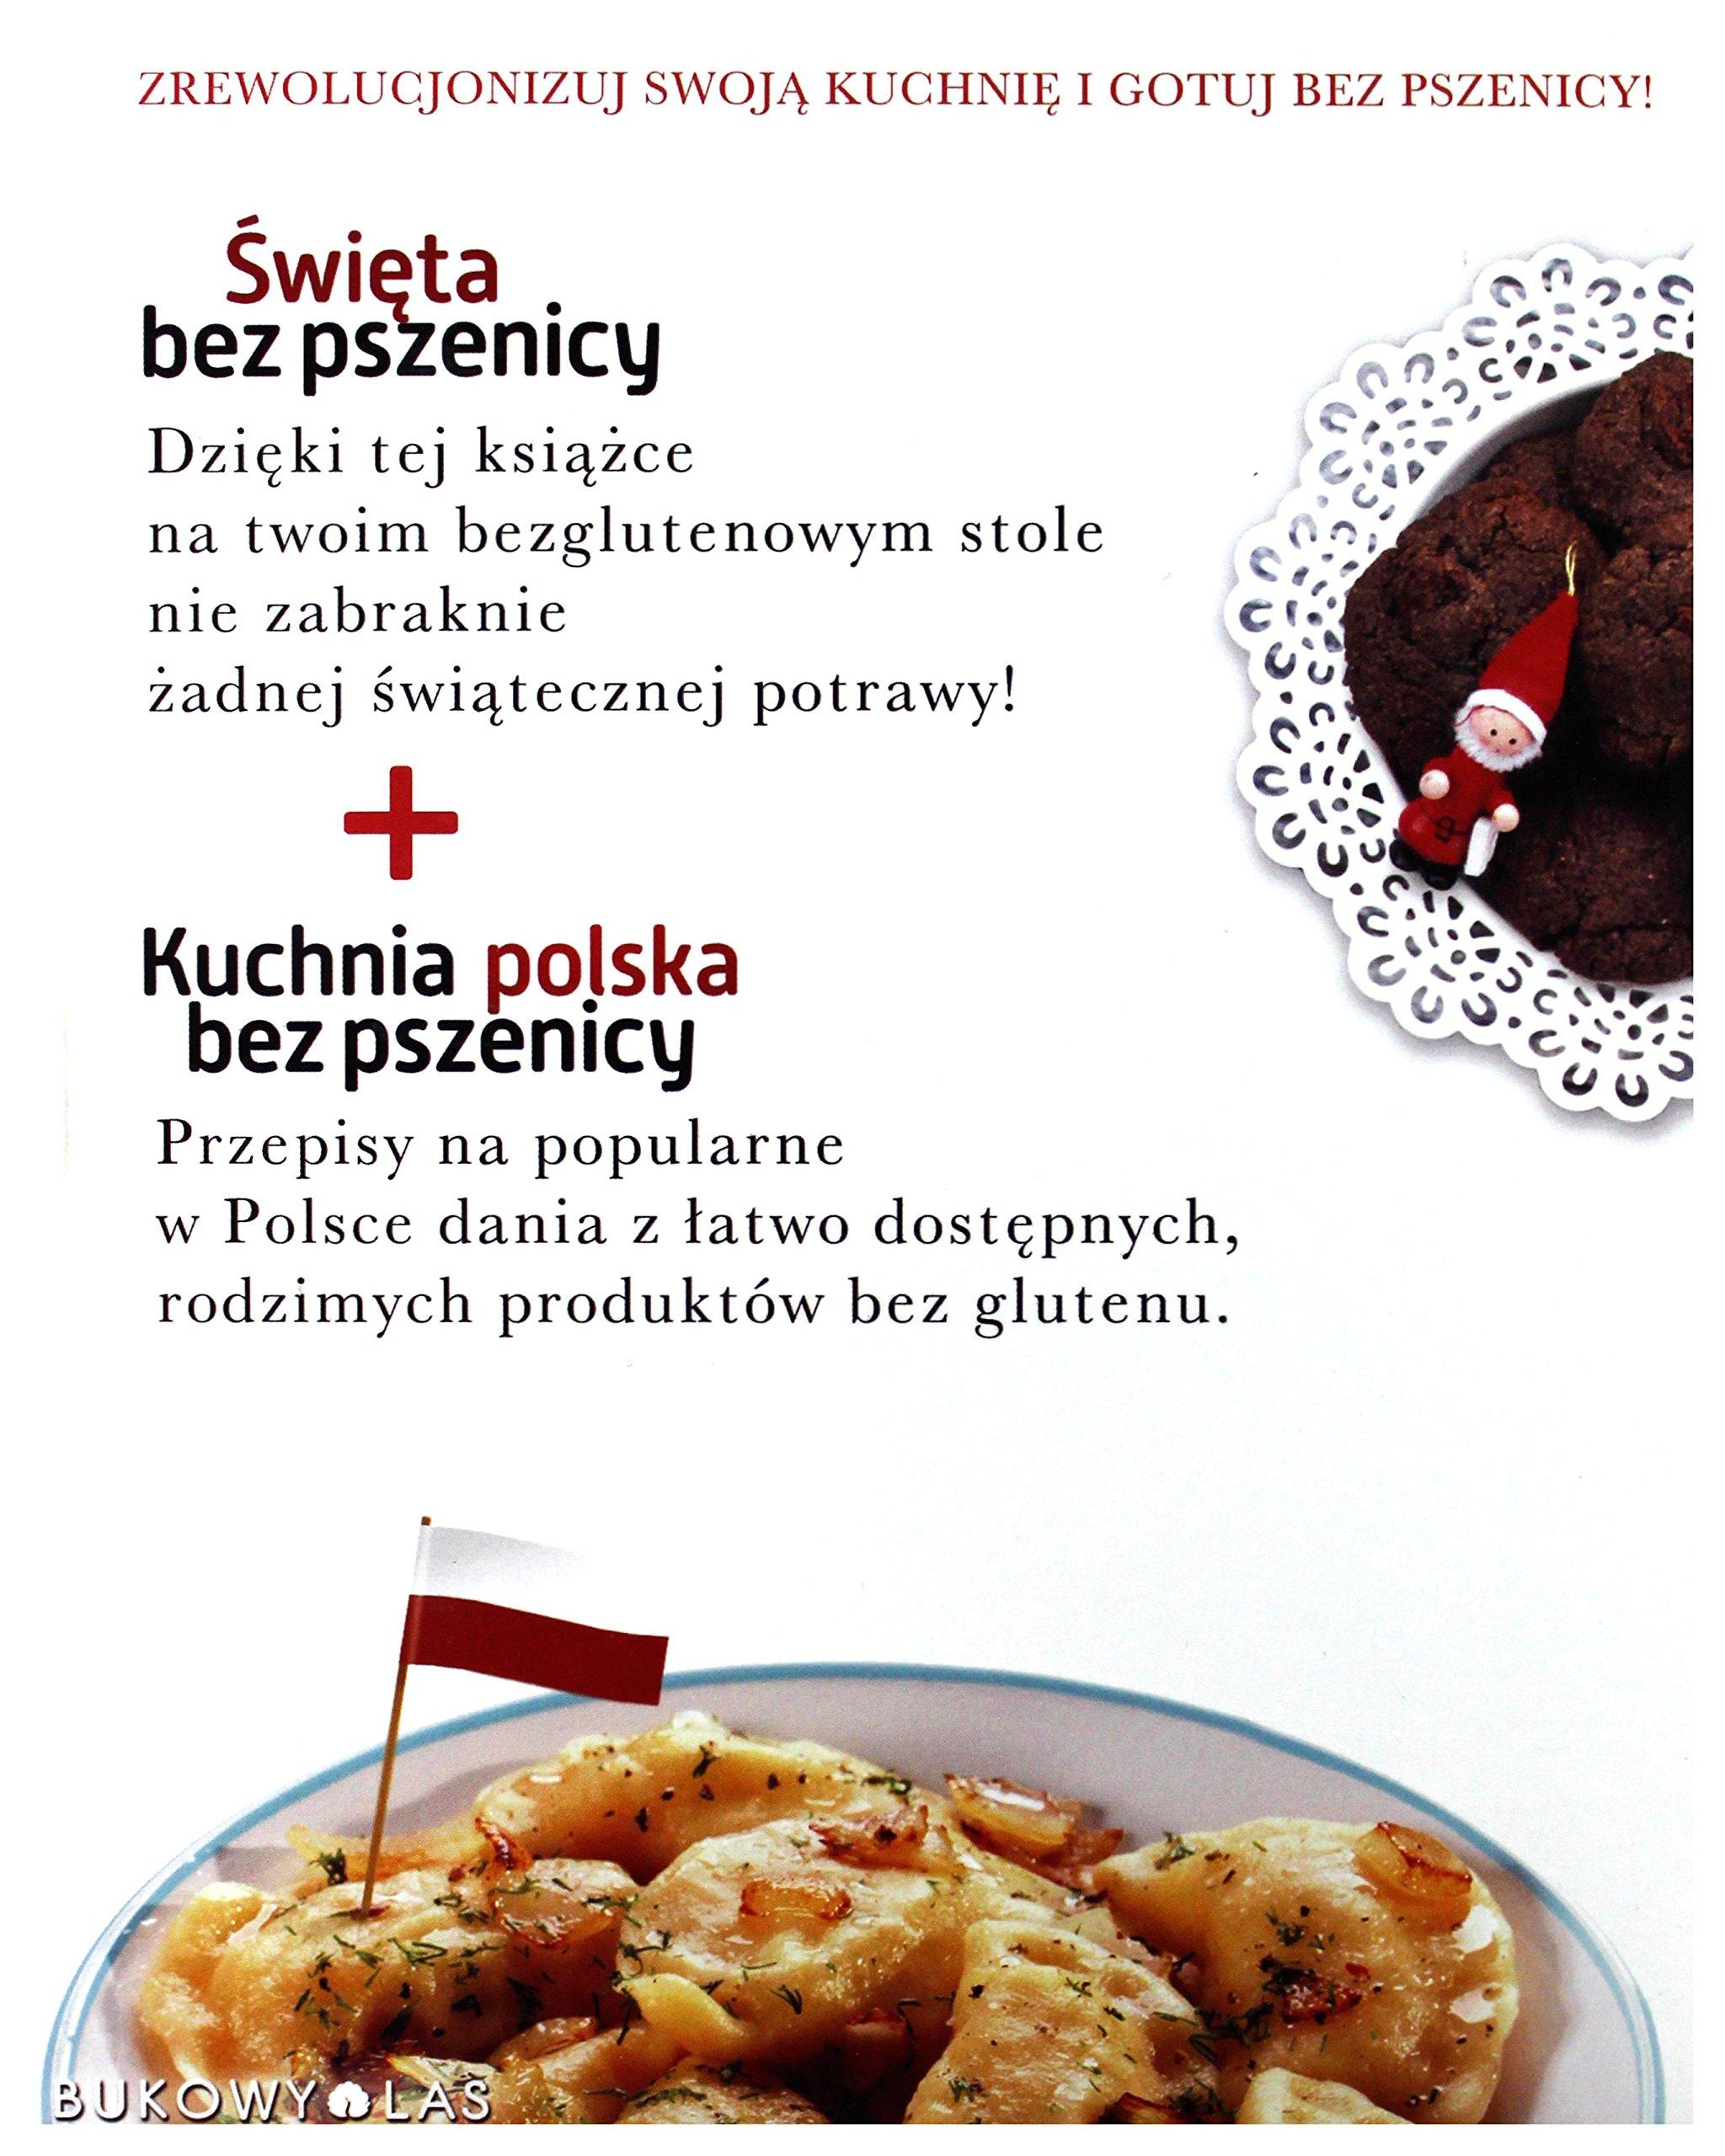 Pakiet ĺšwiäta Bez Pszenicy Kuchnia Polska Marta